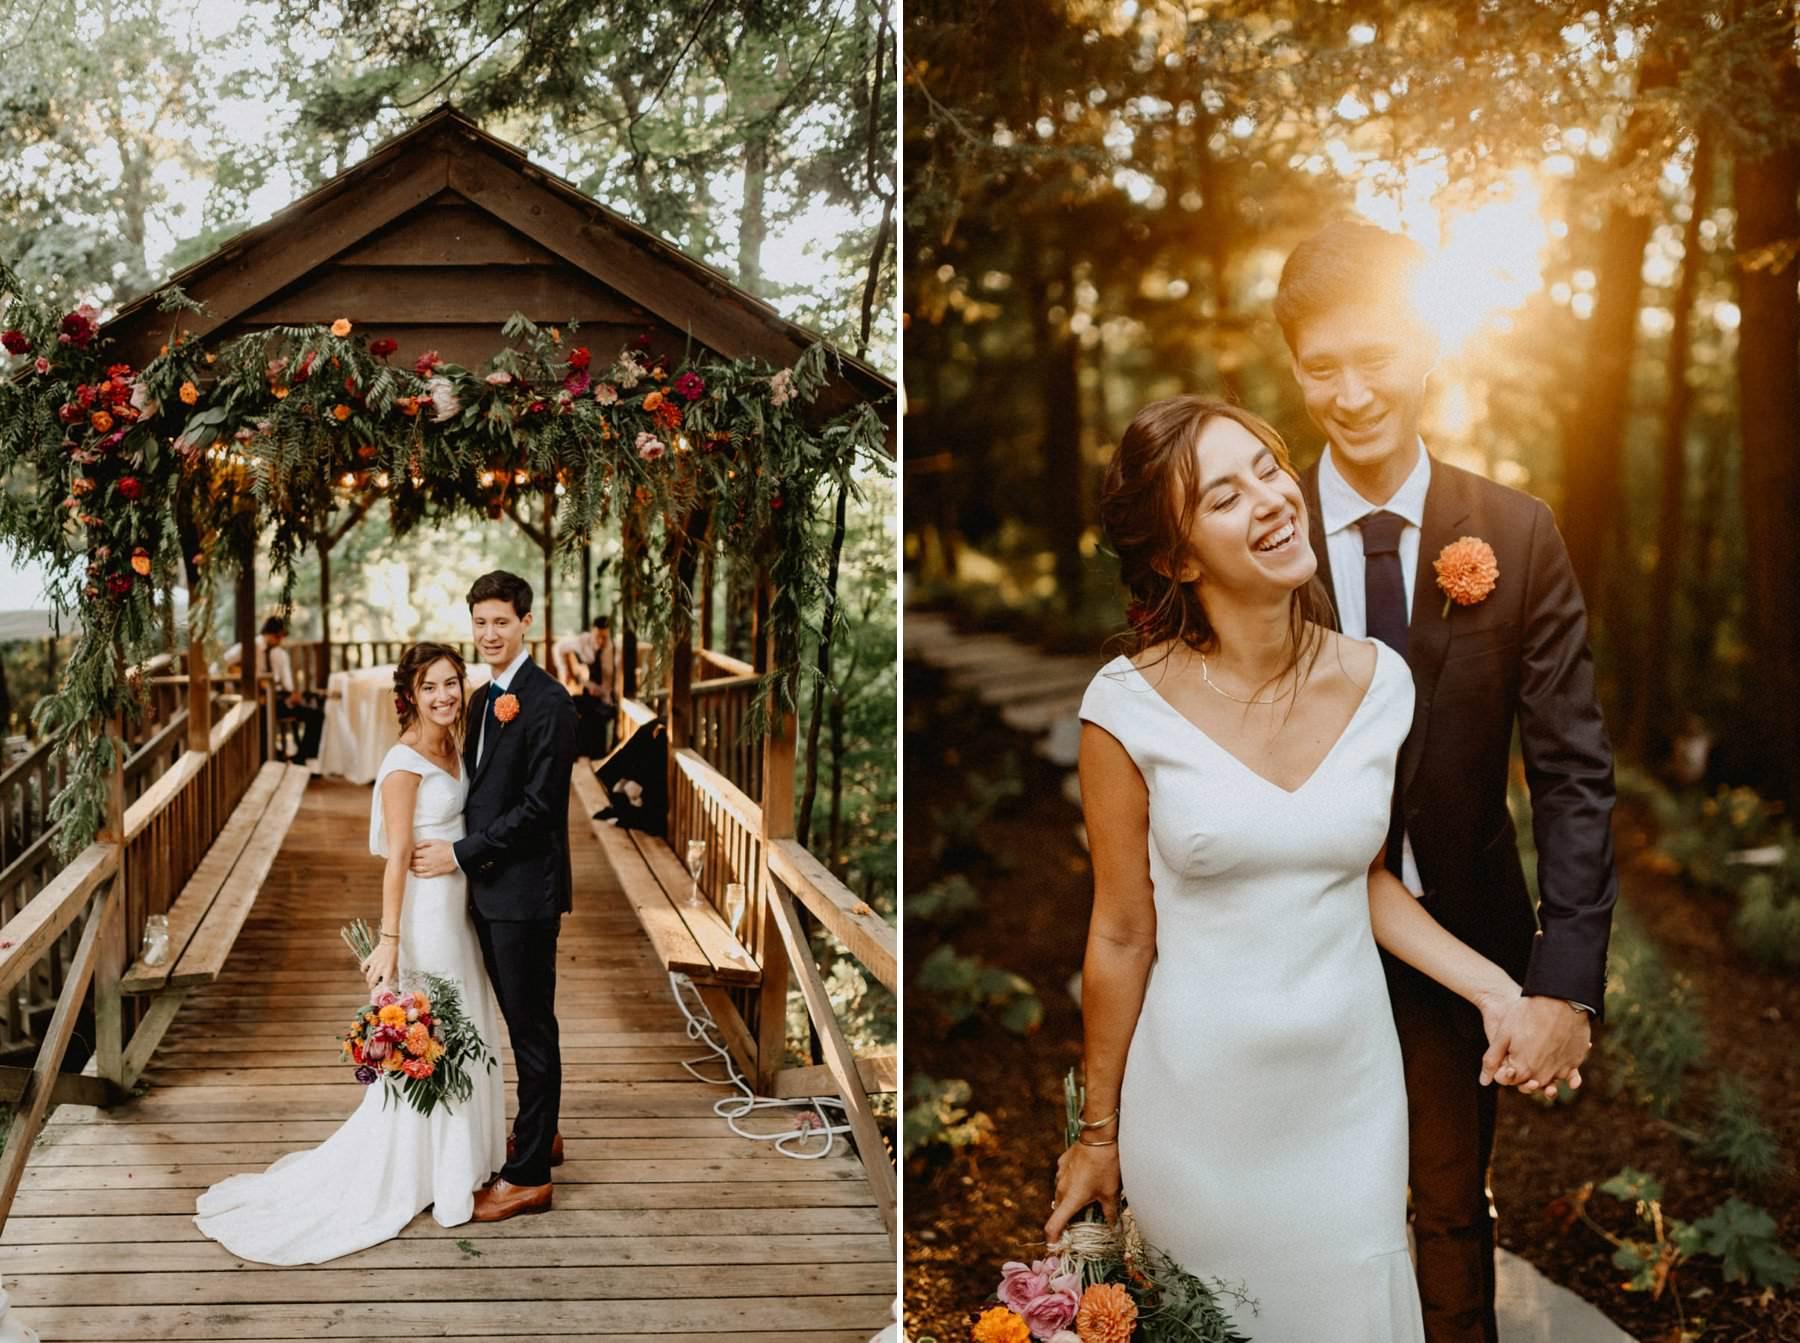 pennsylvania-private-estate-wedding-109.jpg